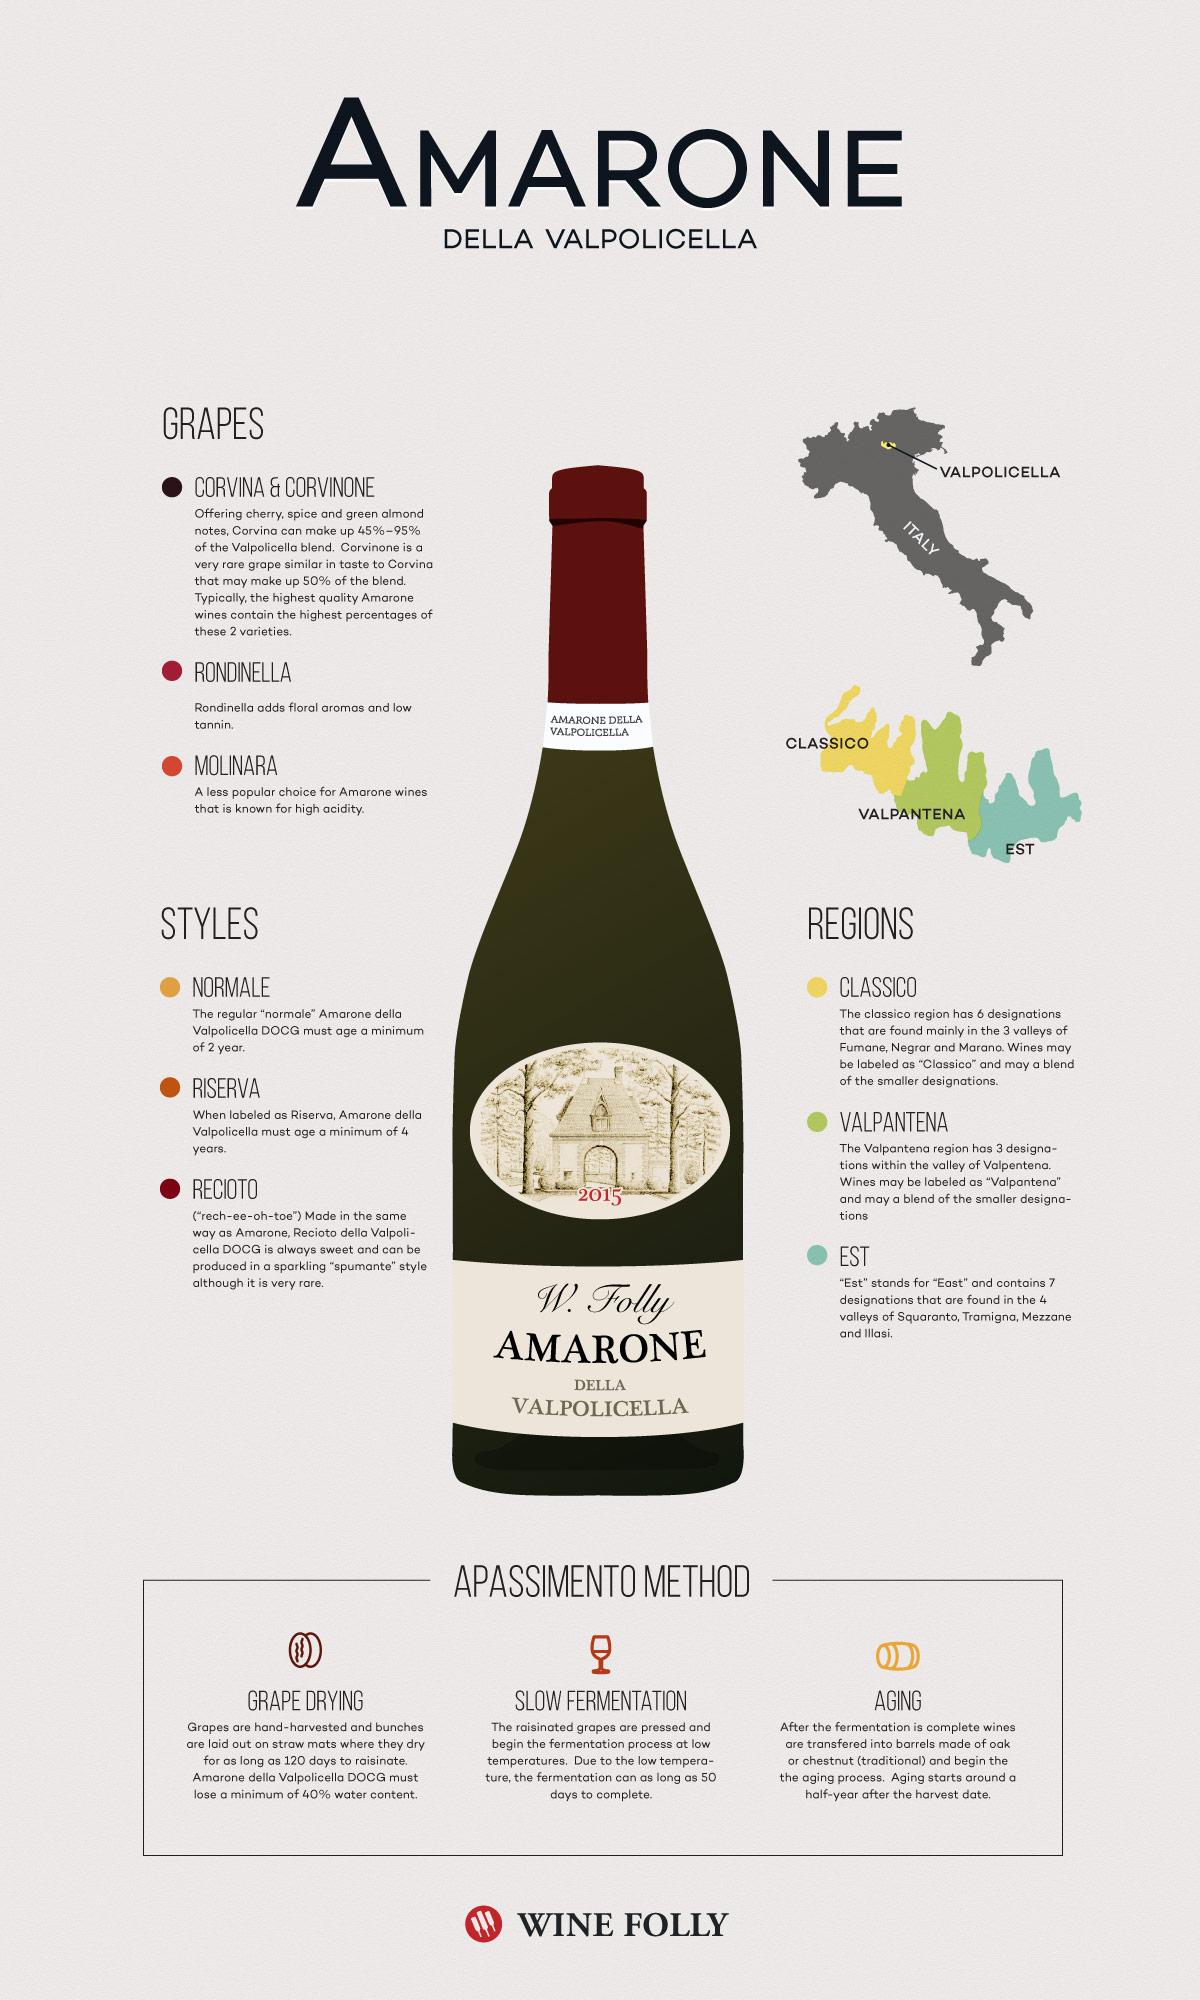 amarone wine turns raisins into gold